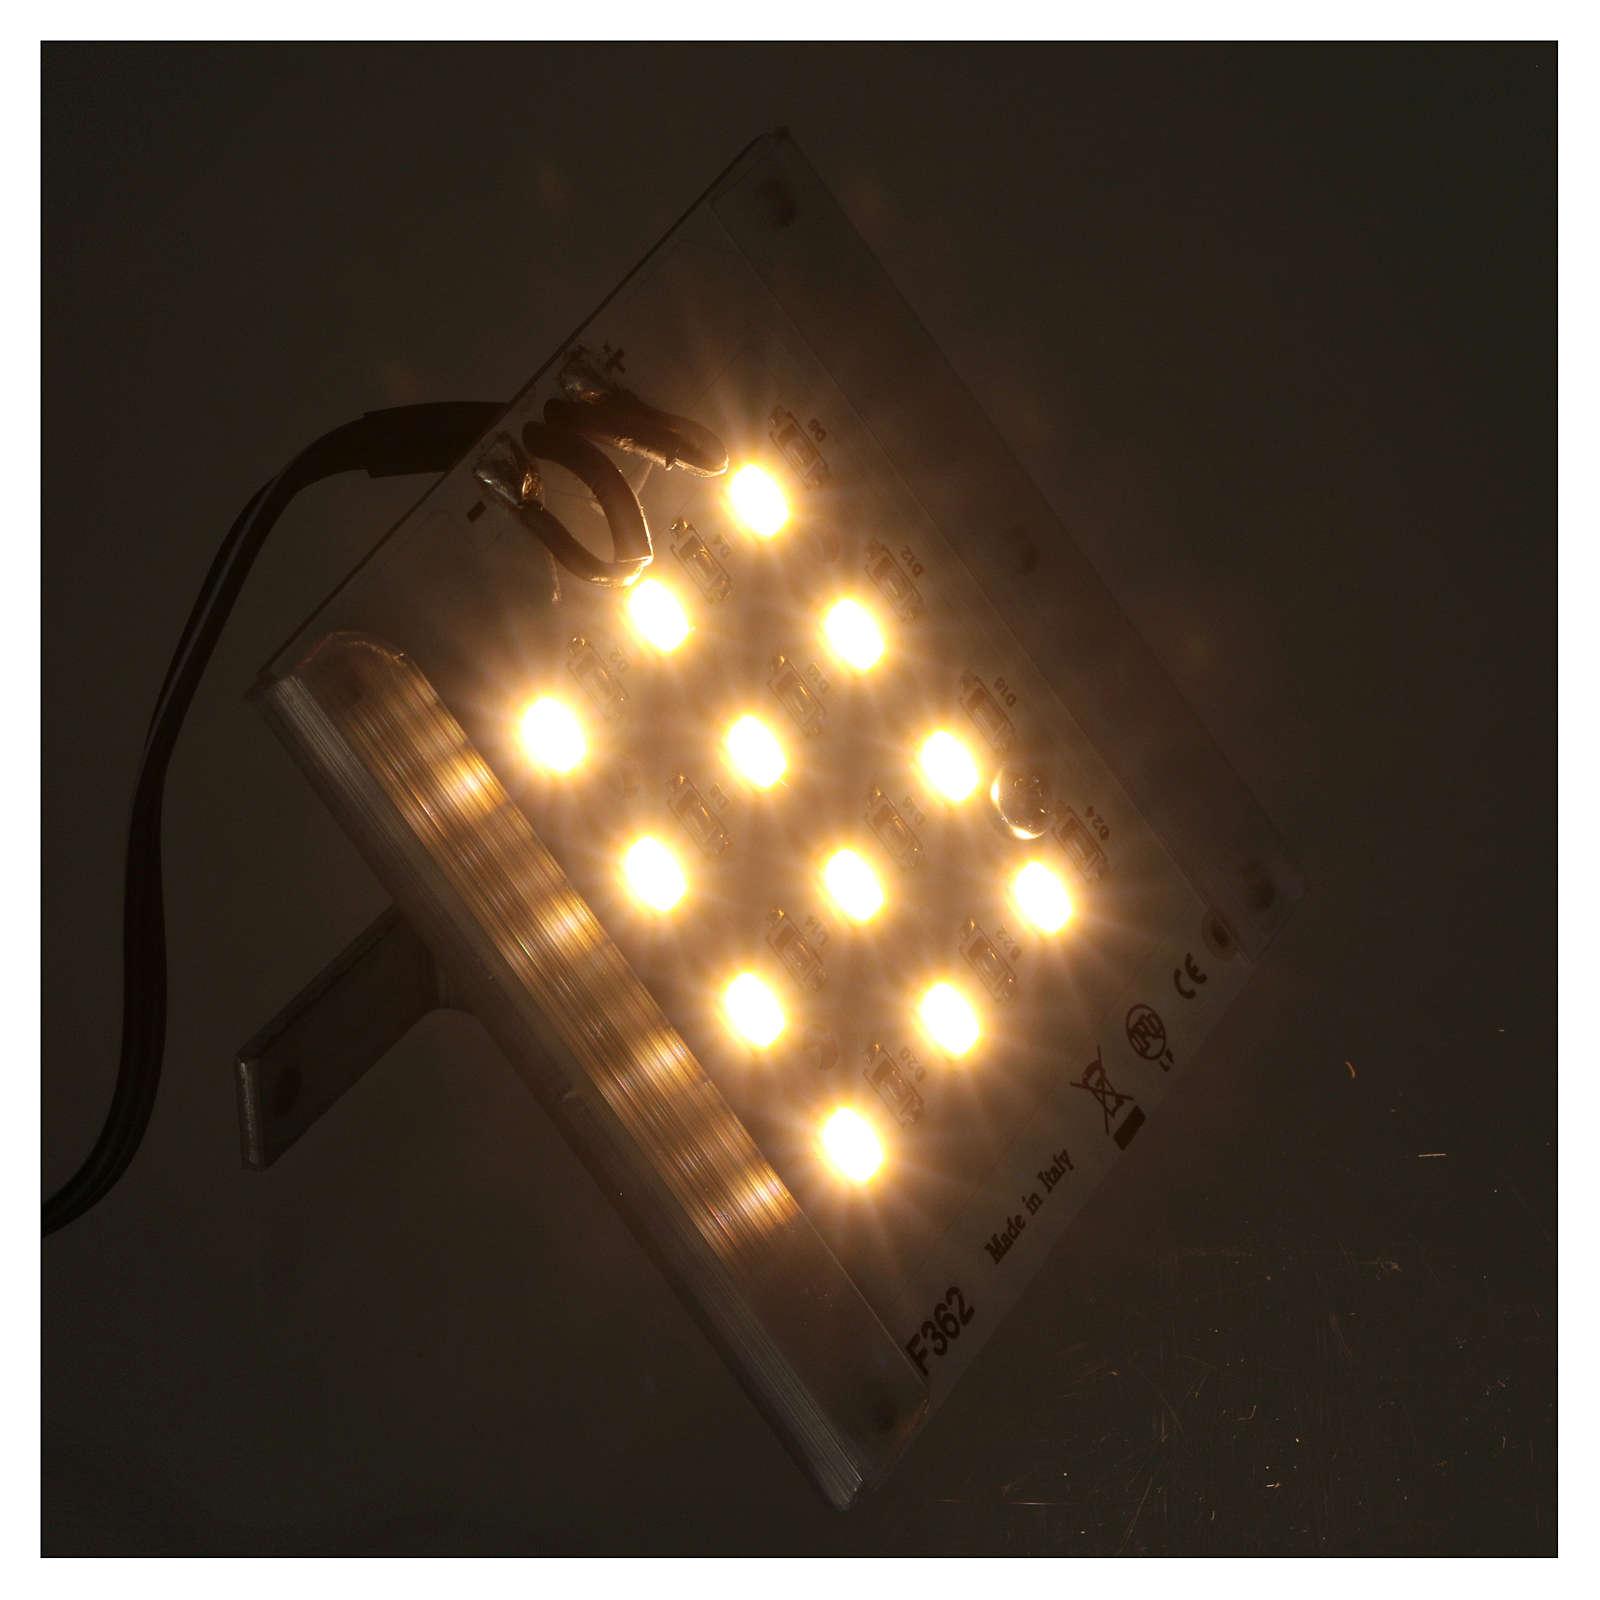 Lampe 4w Chaud Pour 12v Diffuse Fondu Led Blanc Crèche Lumière sdCthQrx